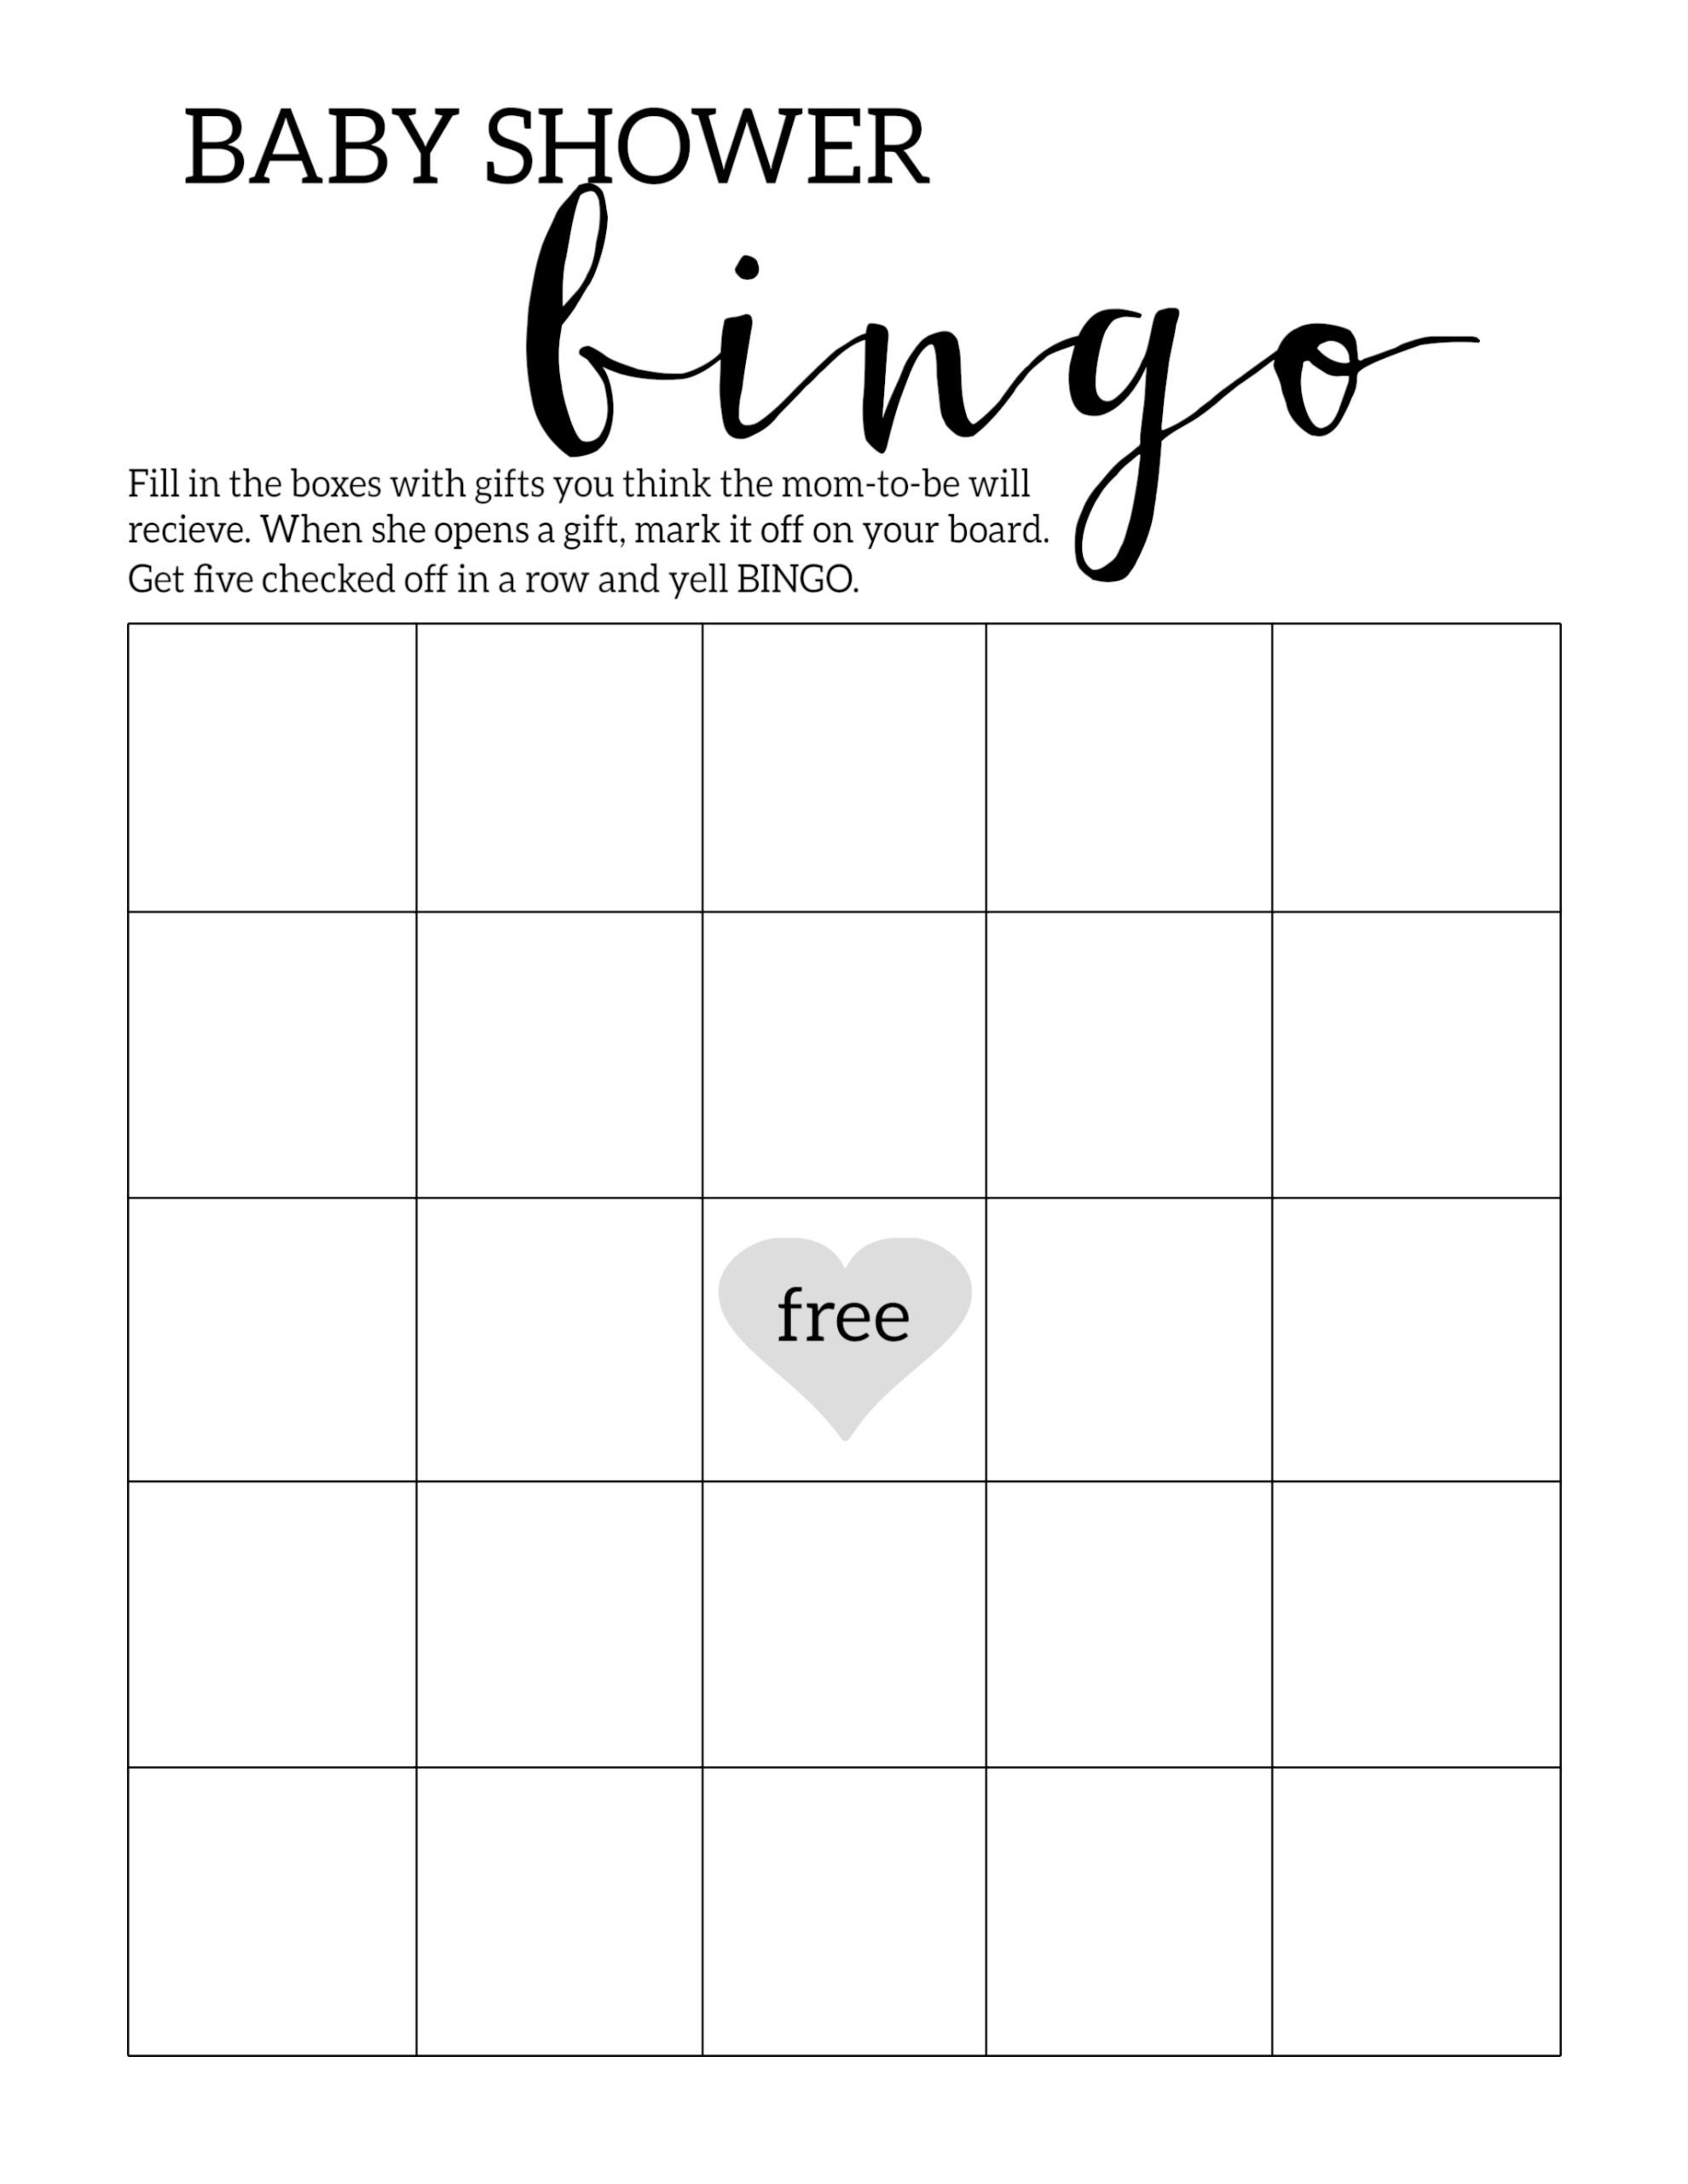 Baby Shower Bingo Printable Cards Template - Paper Trail Design - Free Printable Baby Shower Bingo Cards